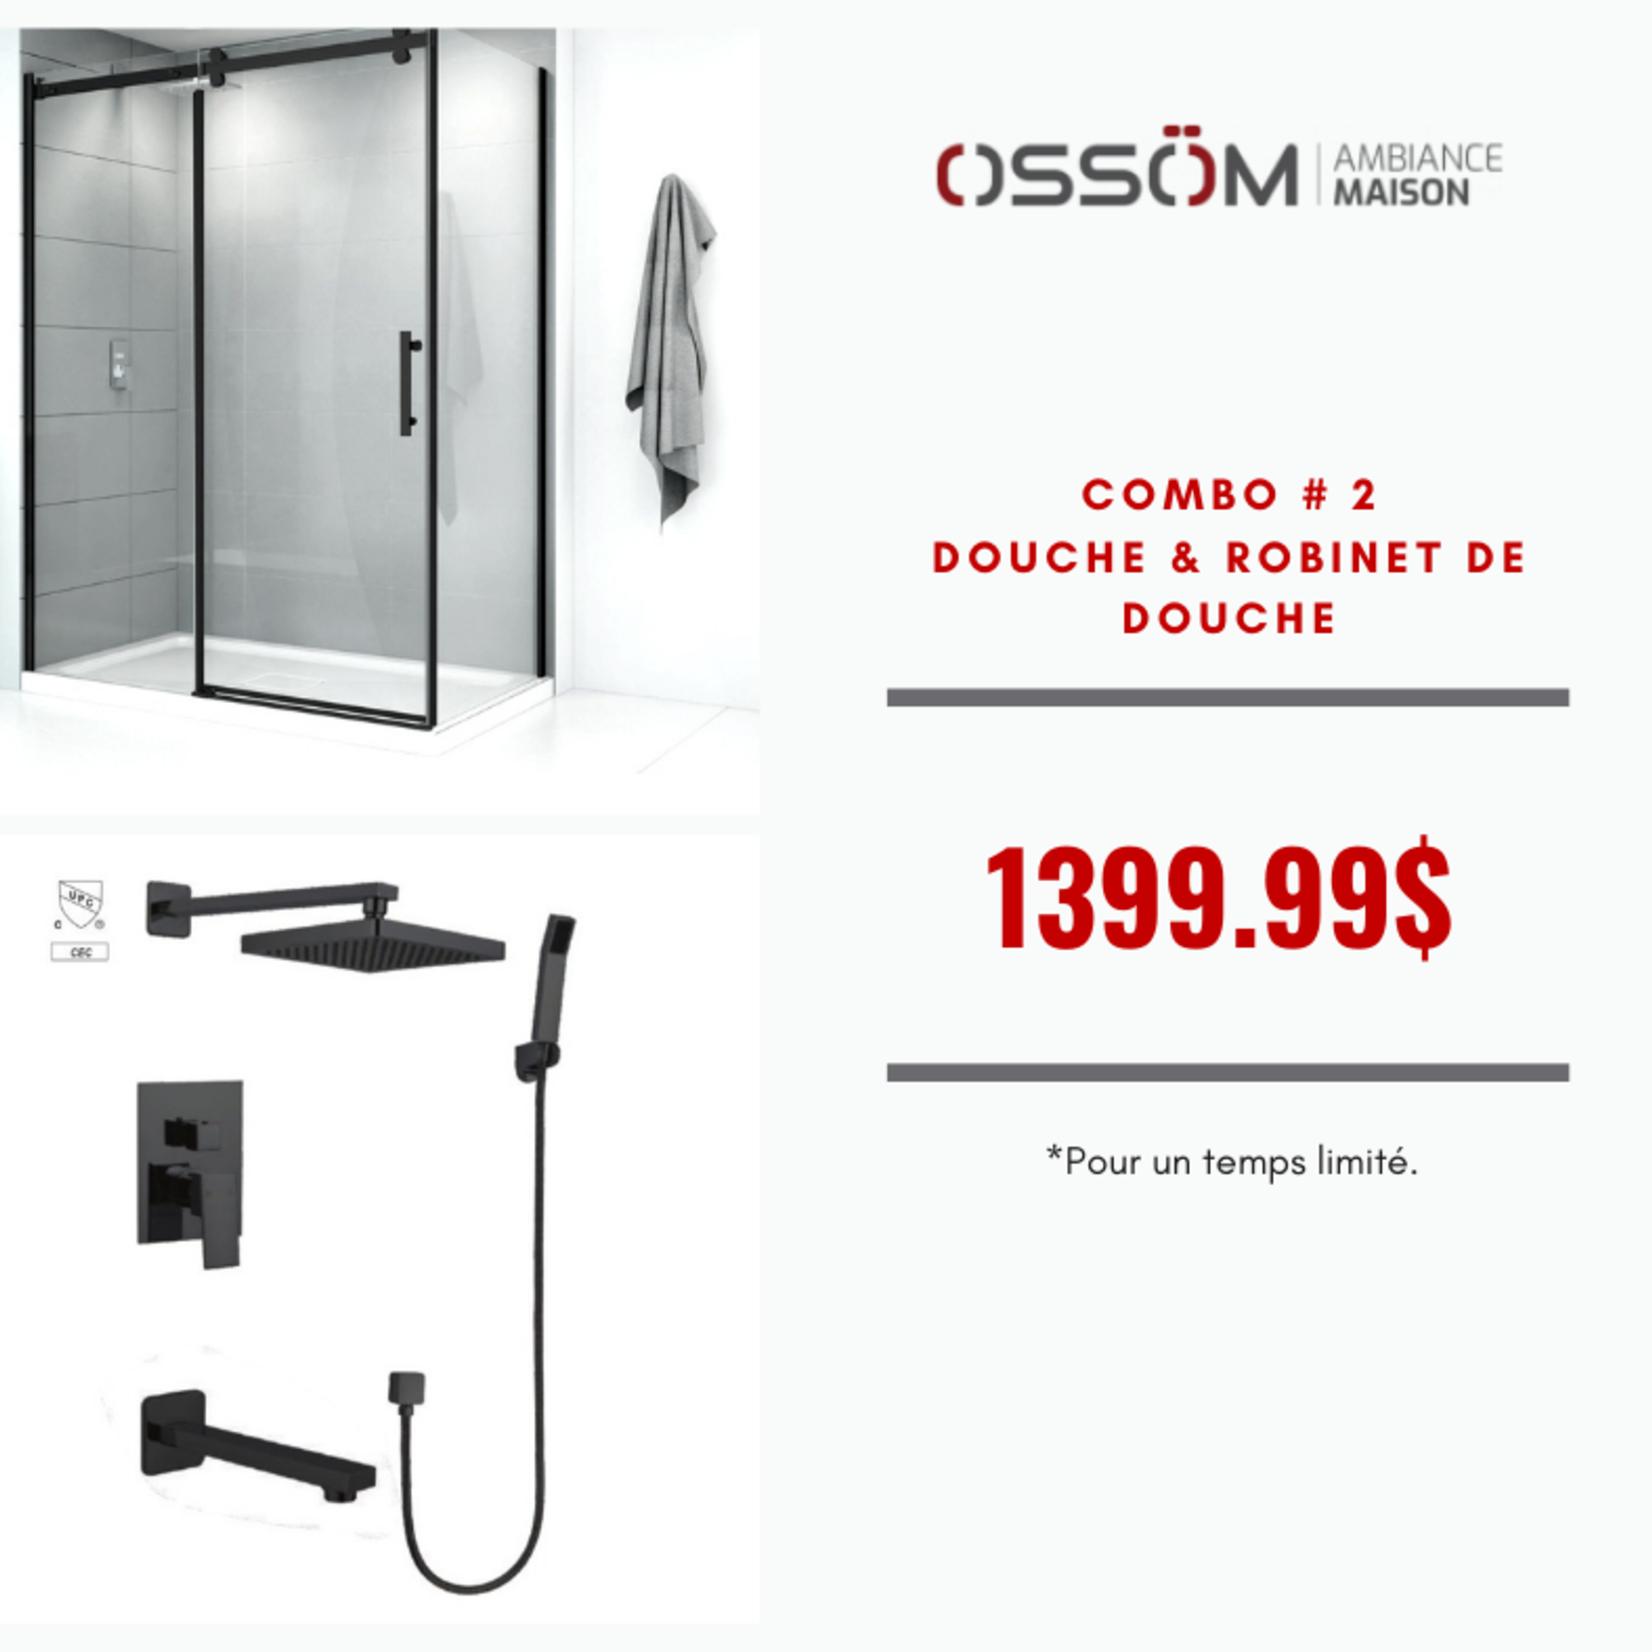 Combo # 2 Promo Shower & Shower Faucet